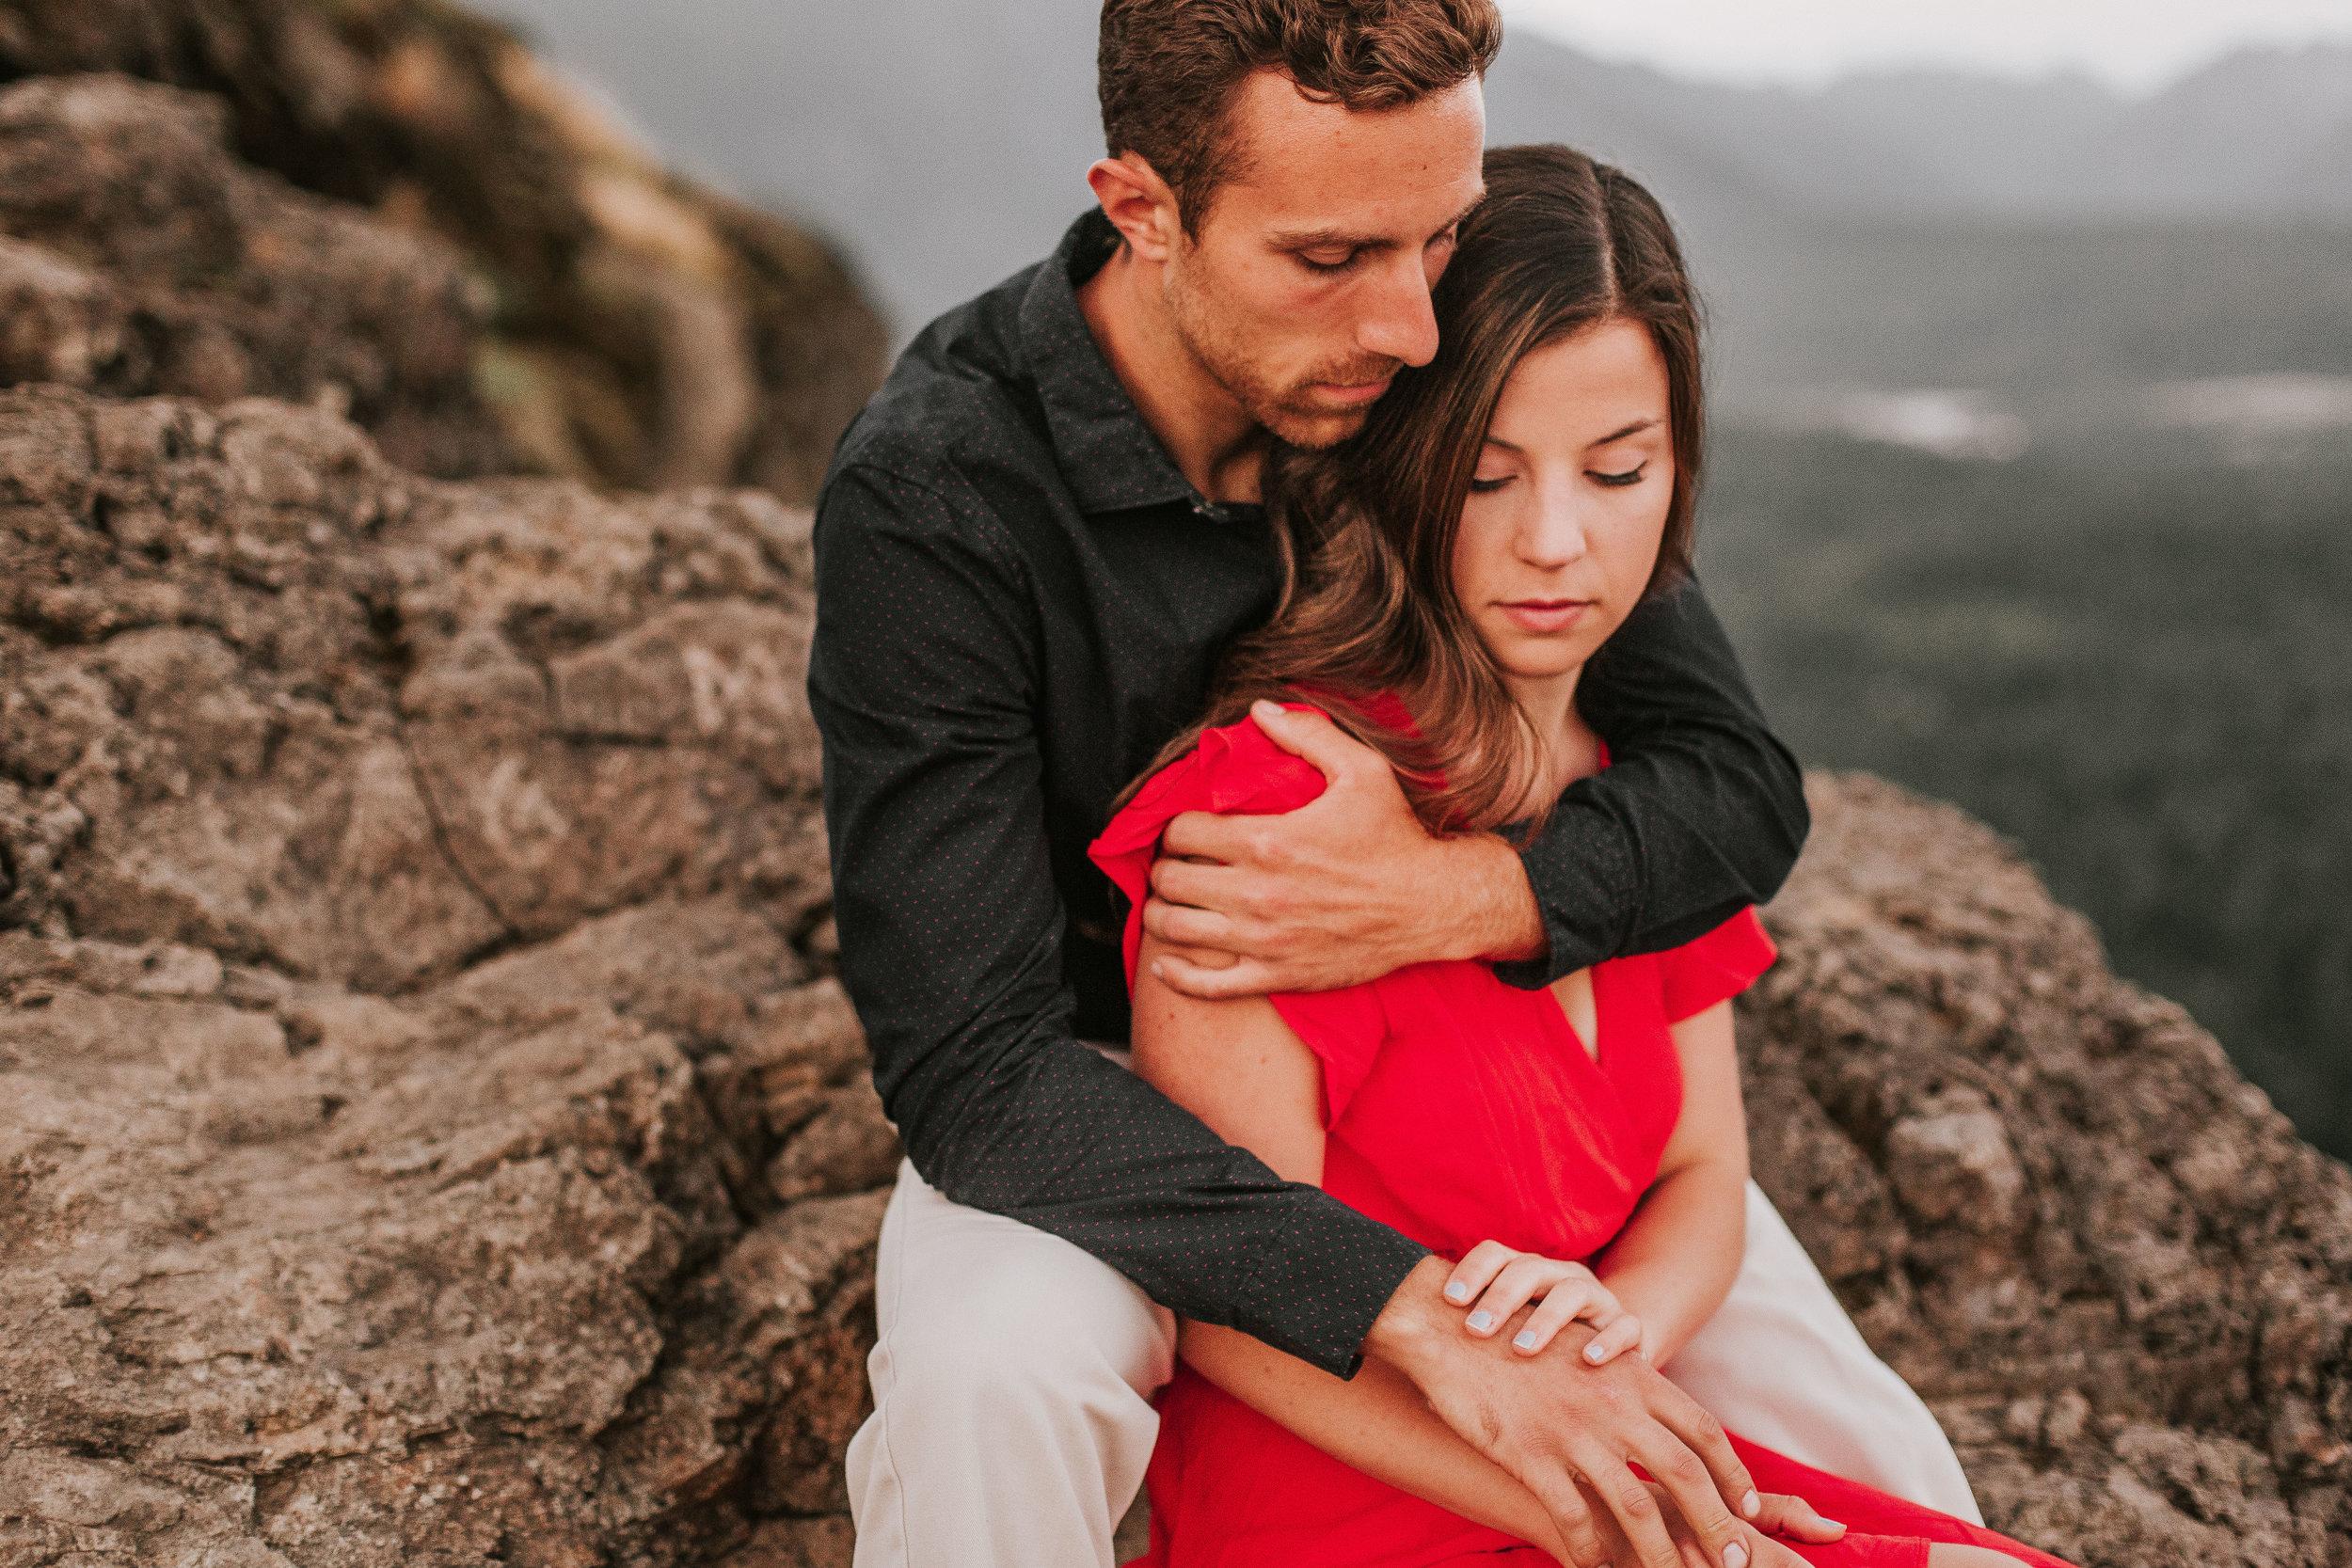 nicole-daacke-photography-rattlesnake-ridge-adventurous-engagement-session-hiking-seattle-washington-destinatino-elopement-intimate-wedding-photographer-37.jpg